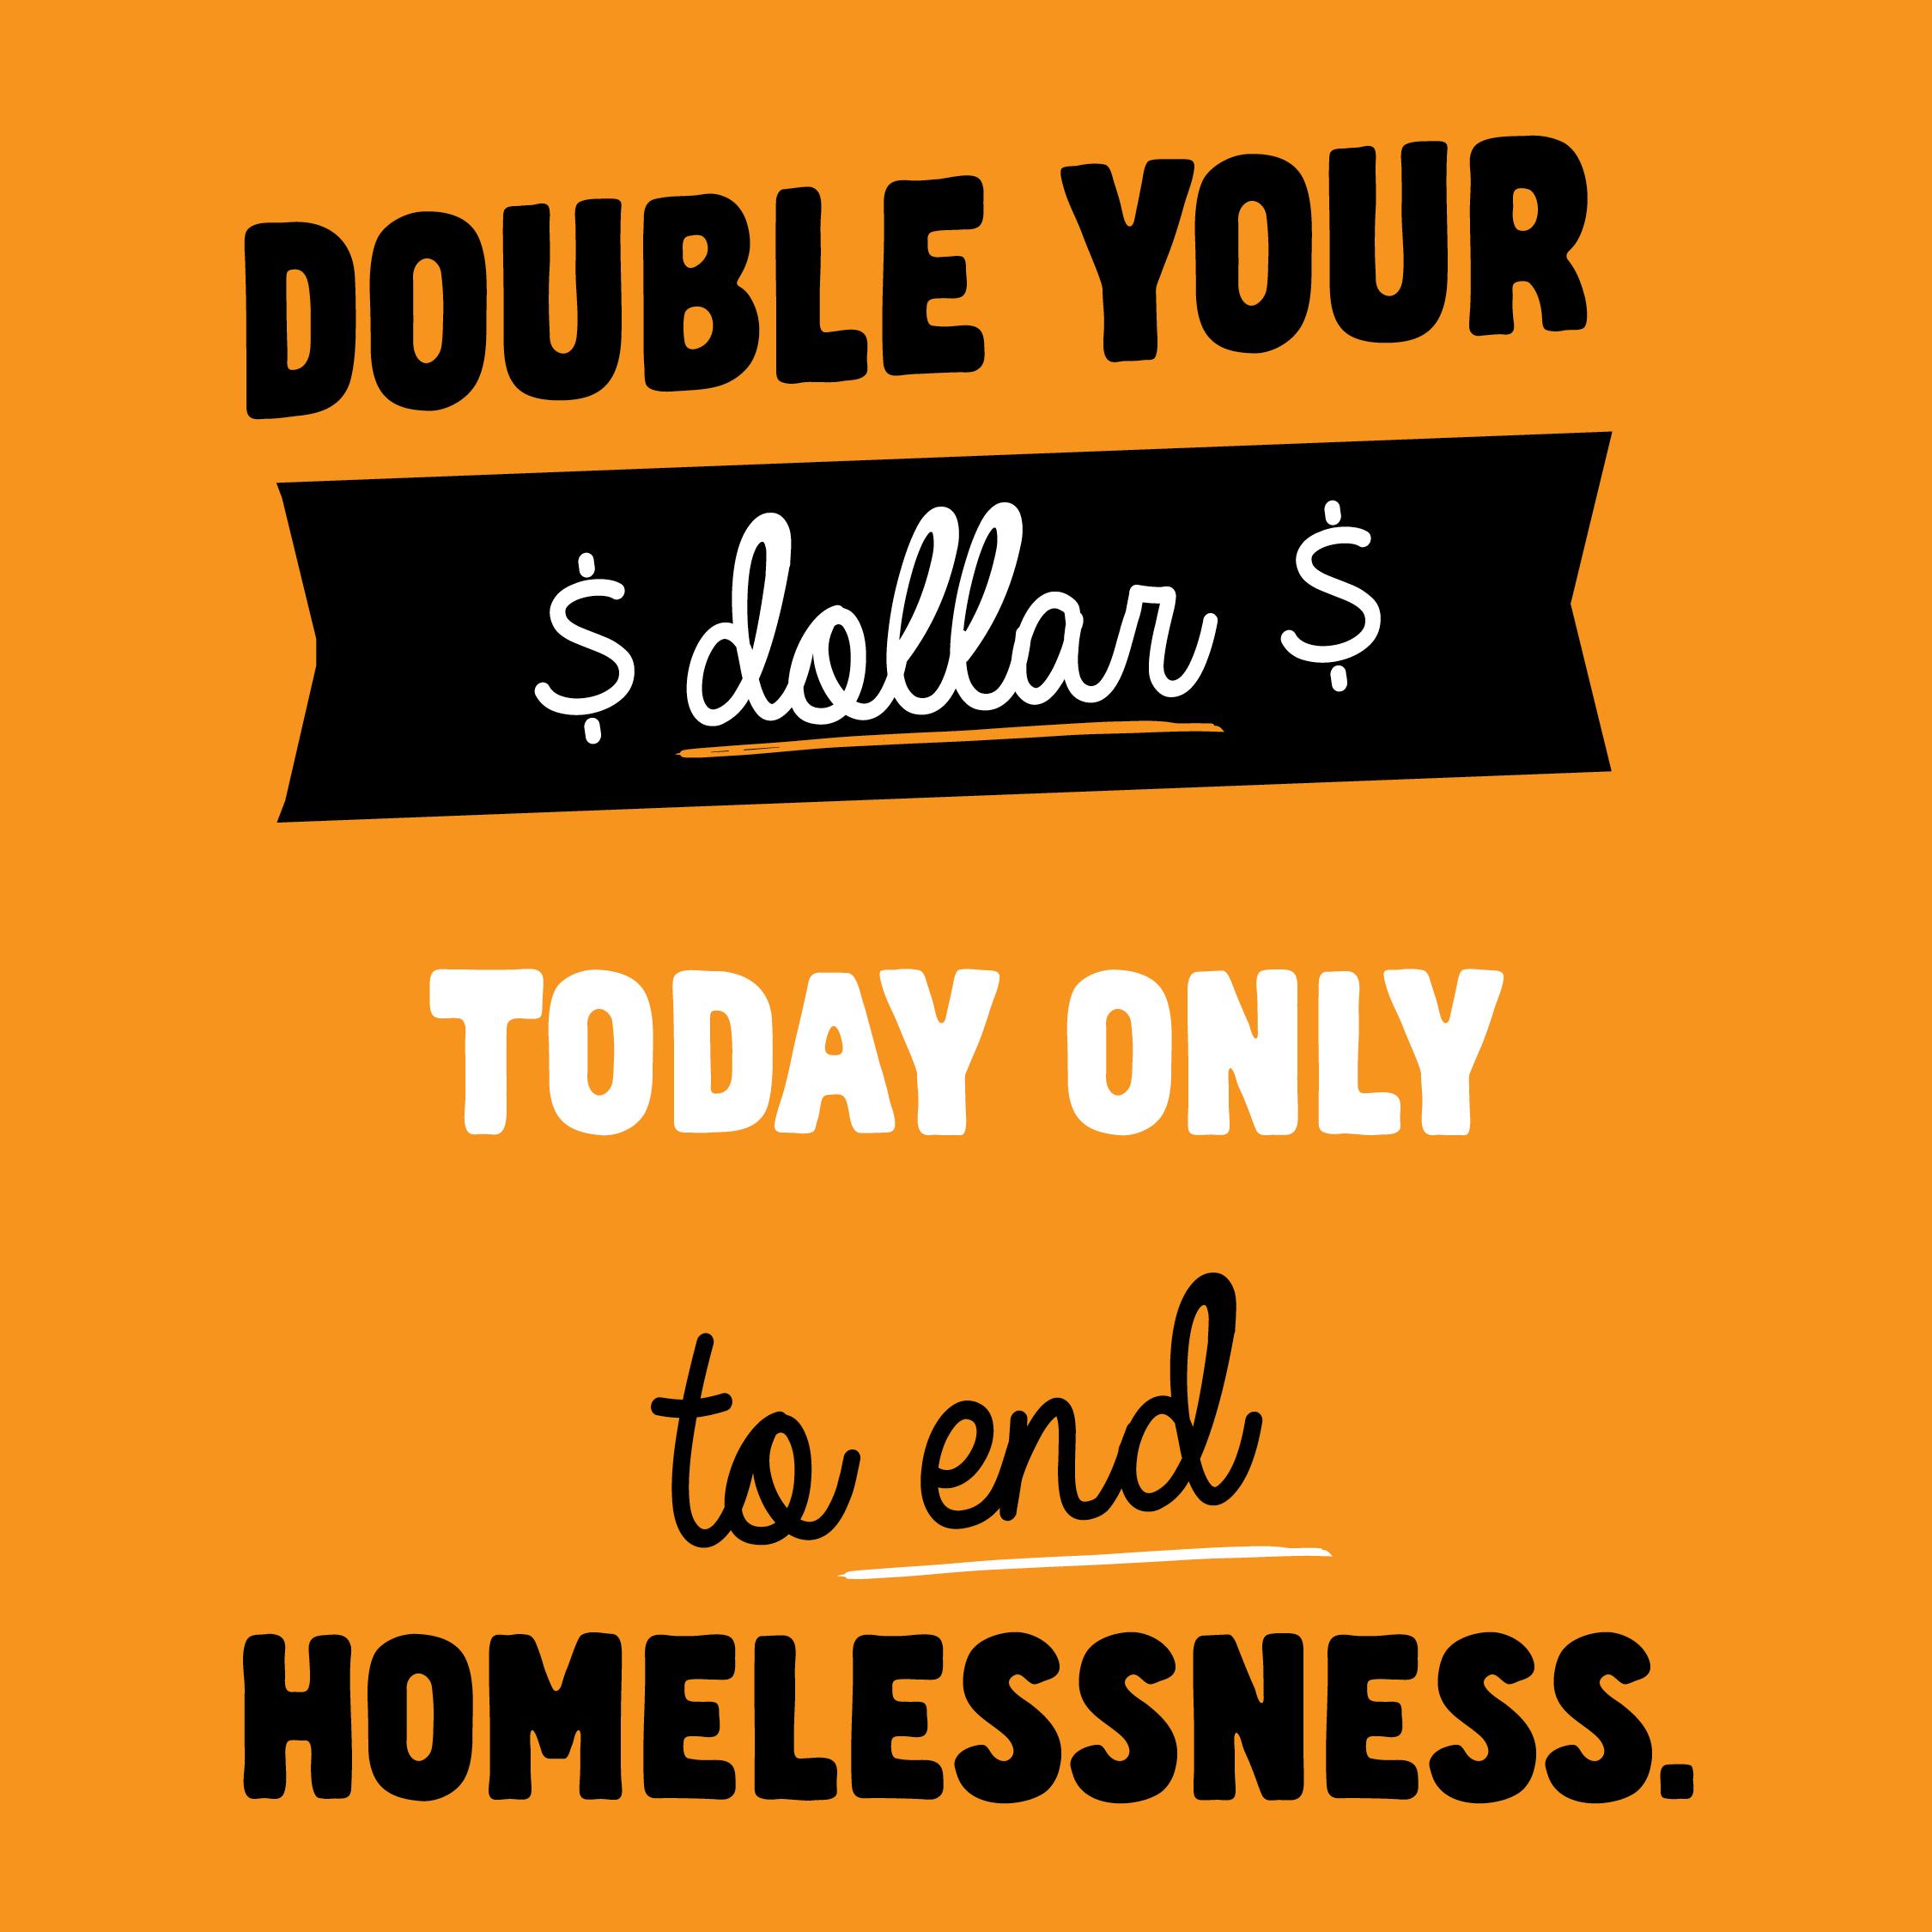 Social Tile - Double your Dollar